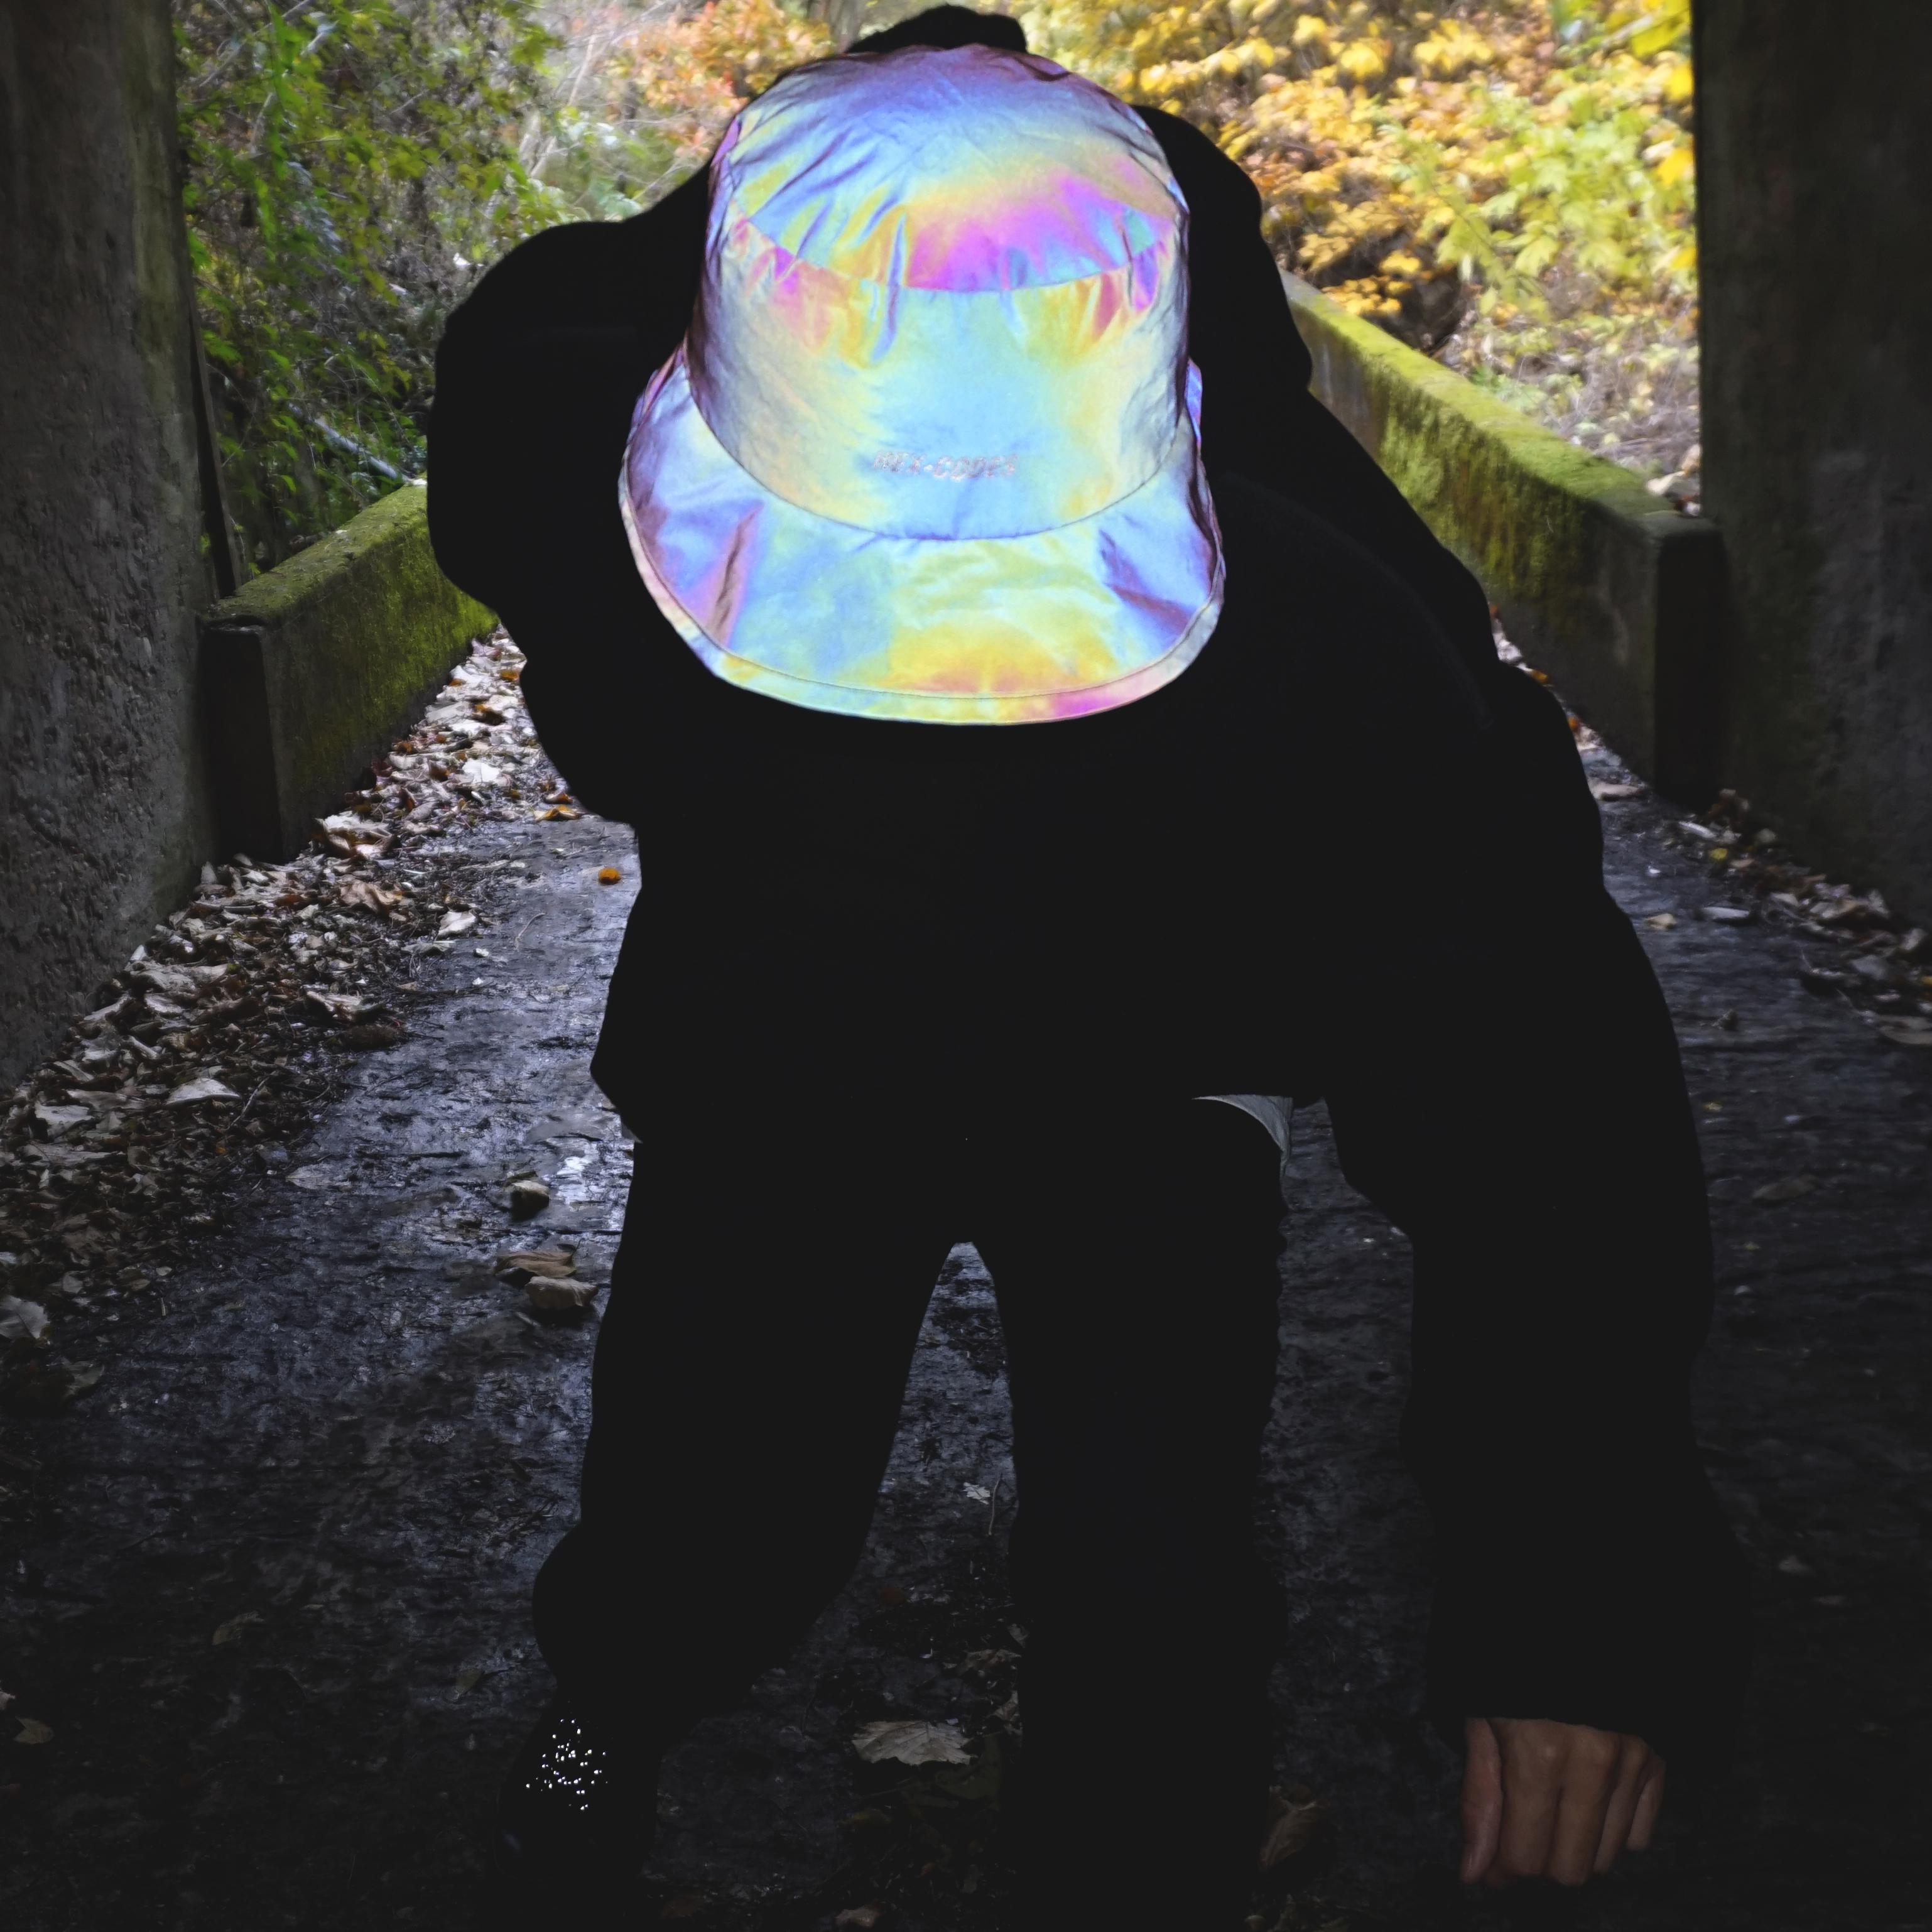 H07 REFLECTIVE HAT WITH 3M HOLOGRAM 홀로그램 버킷햇 모자